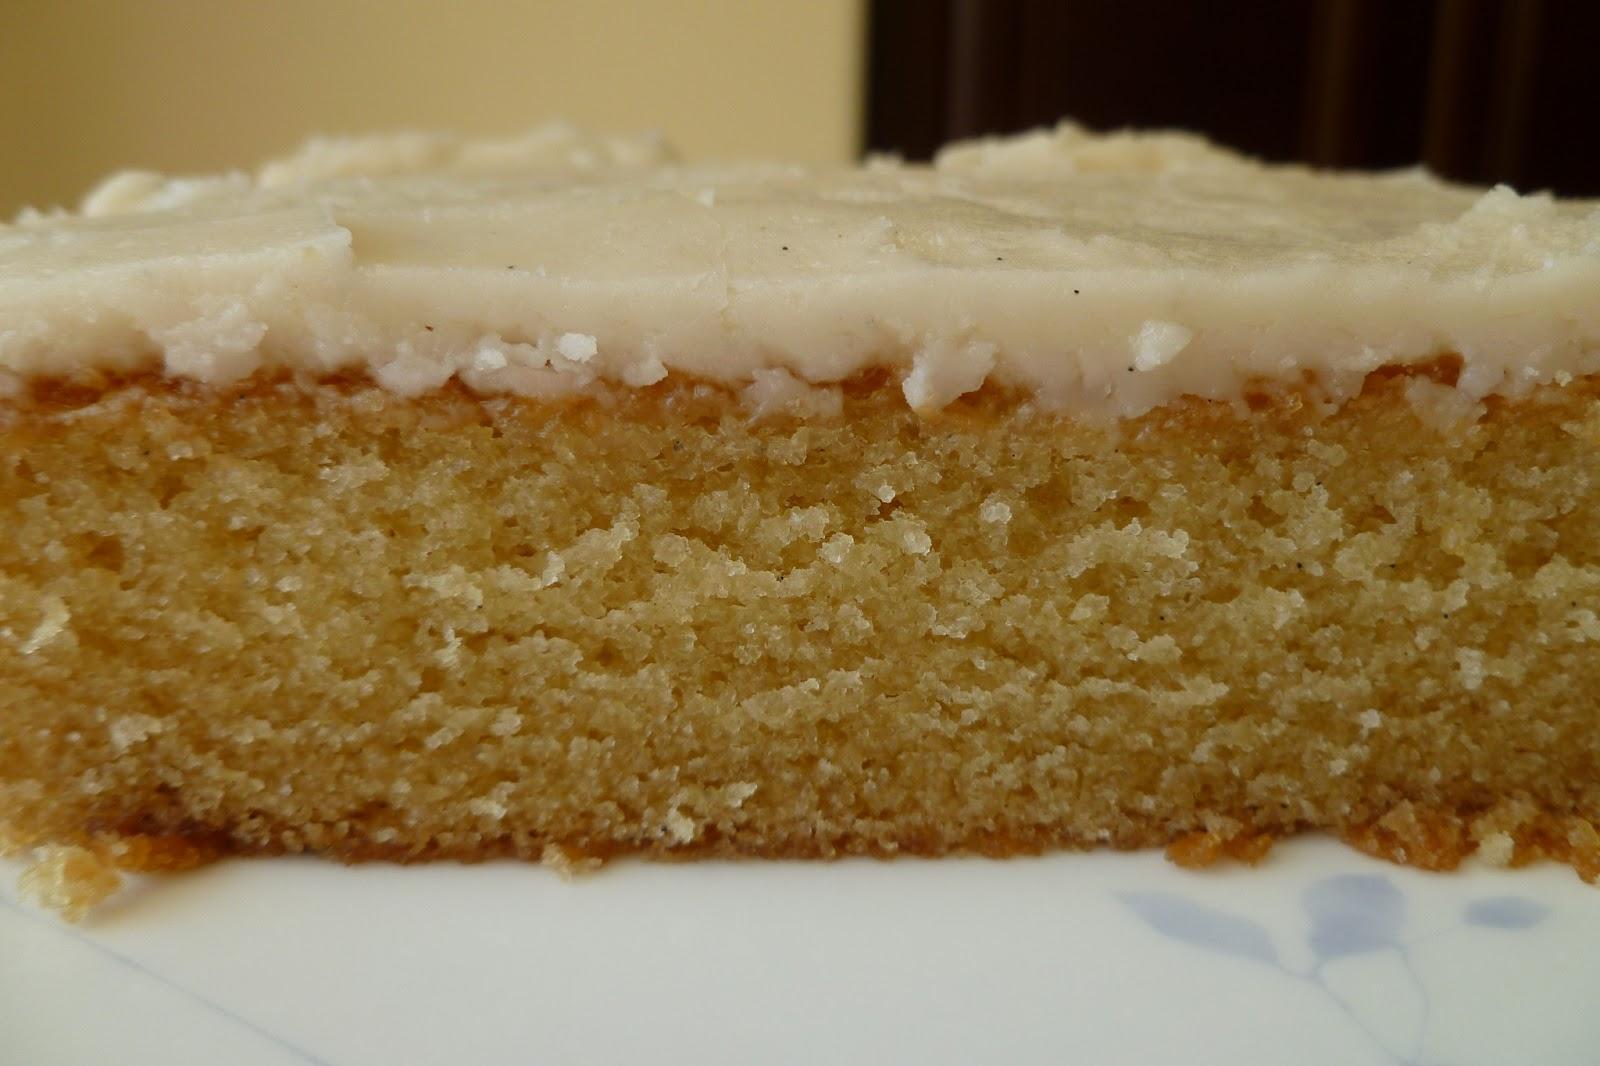 Texas Sheet Cake Recipe With Cake Mix